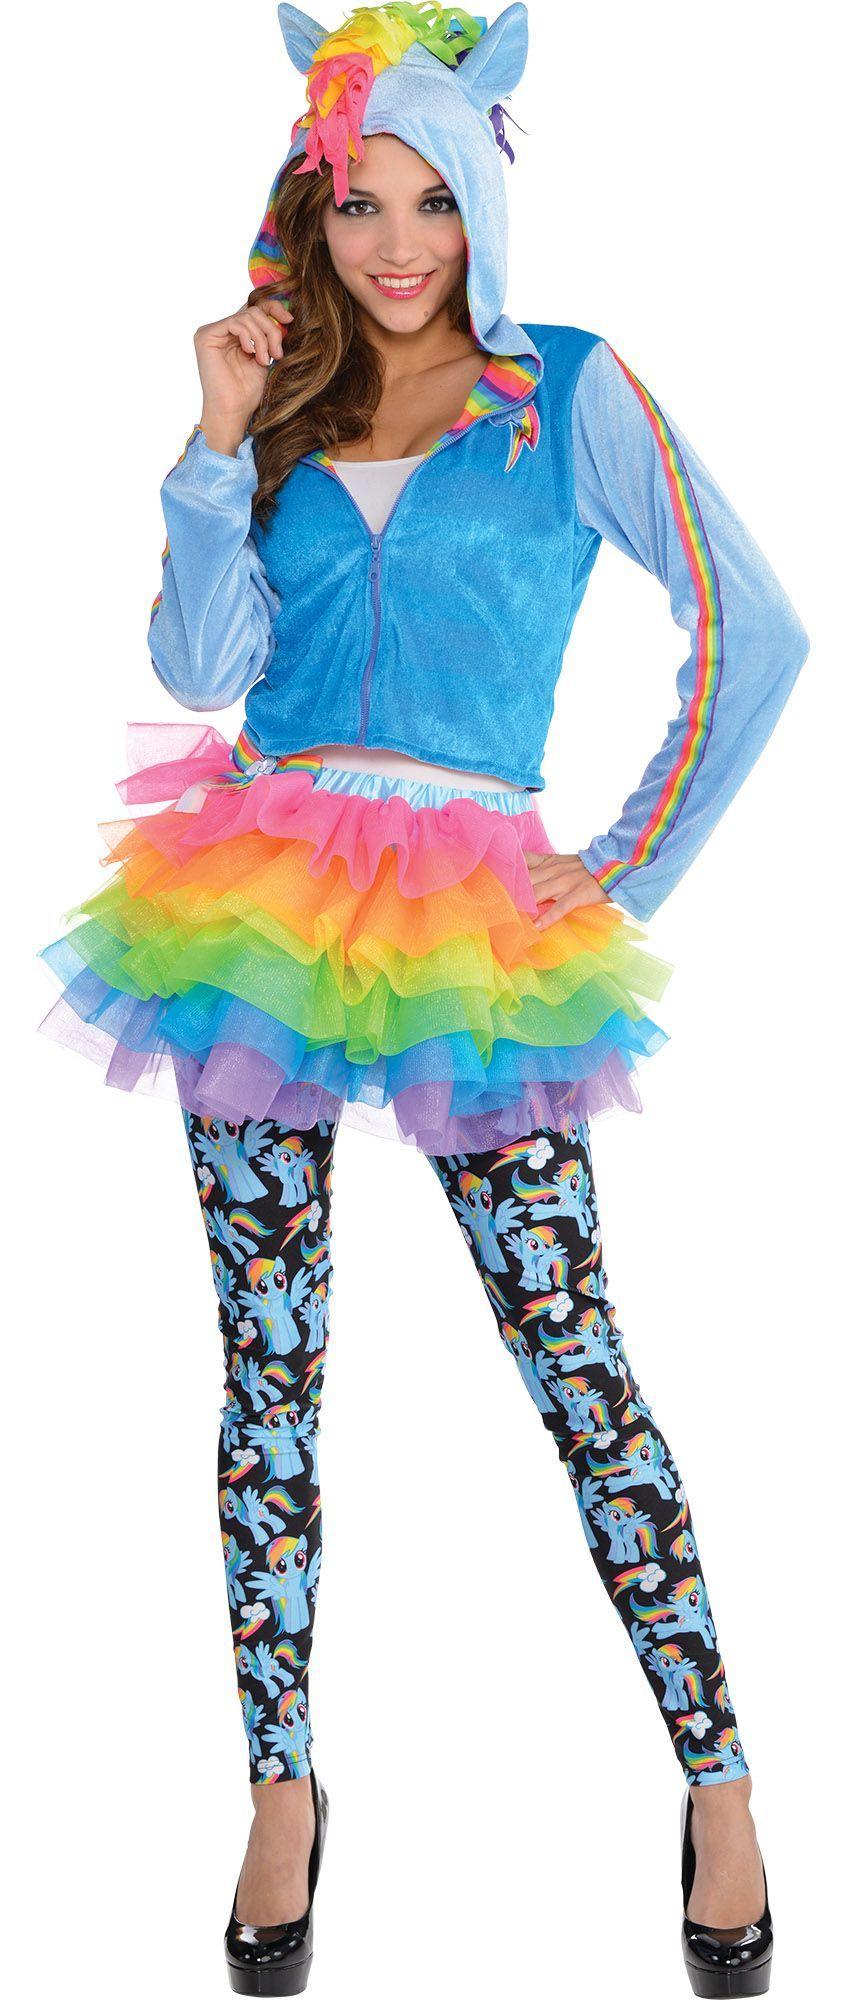 Create Your Own Women's Rainbow Dash Rainbow dash